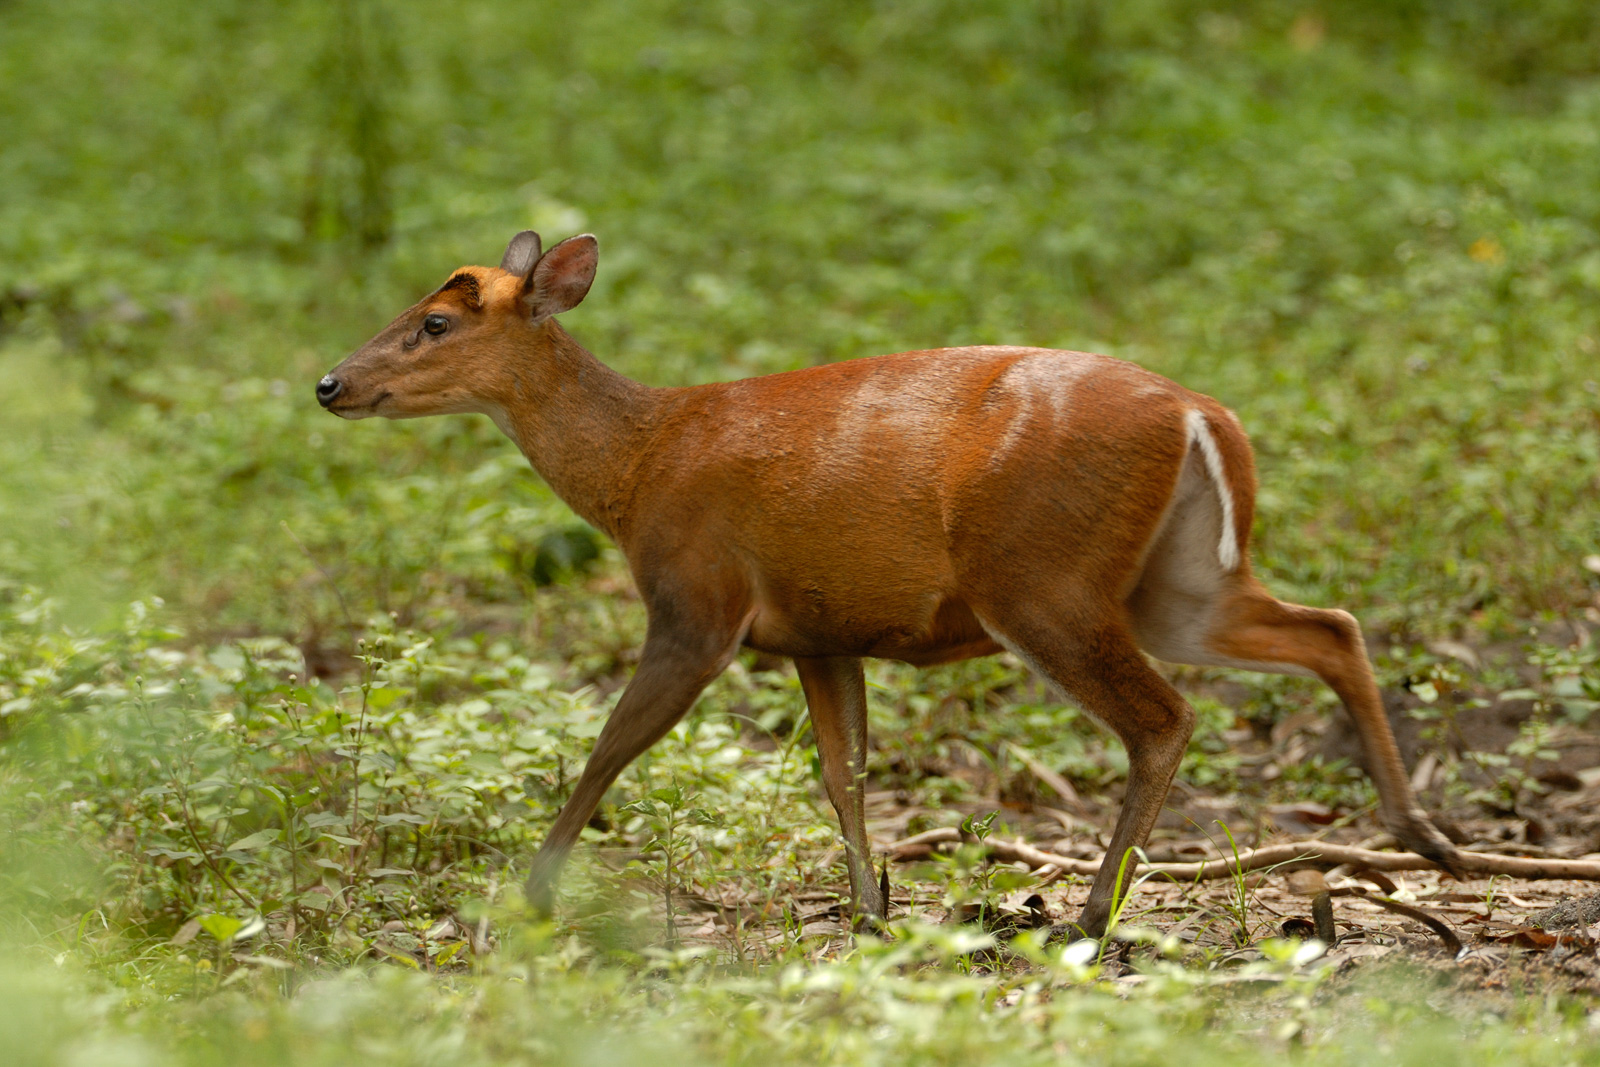 https://upload.wikimedia.org/wikipedia/commons/8/8d/Barking_deer_in_BR_hills.jpg